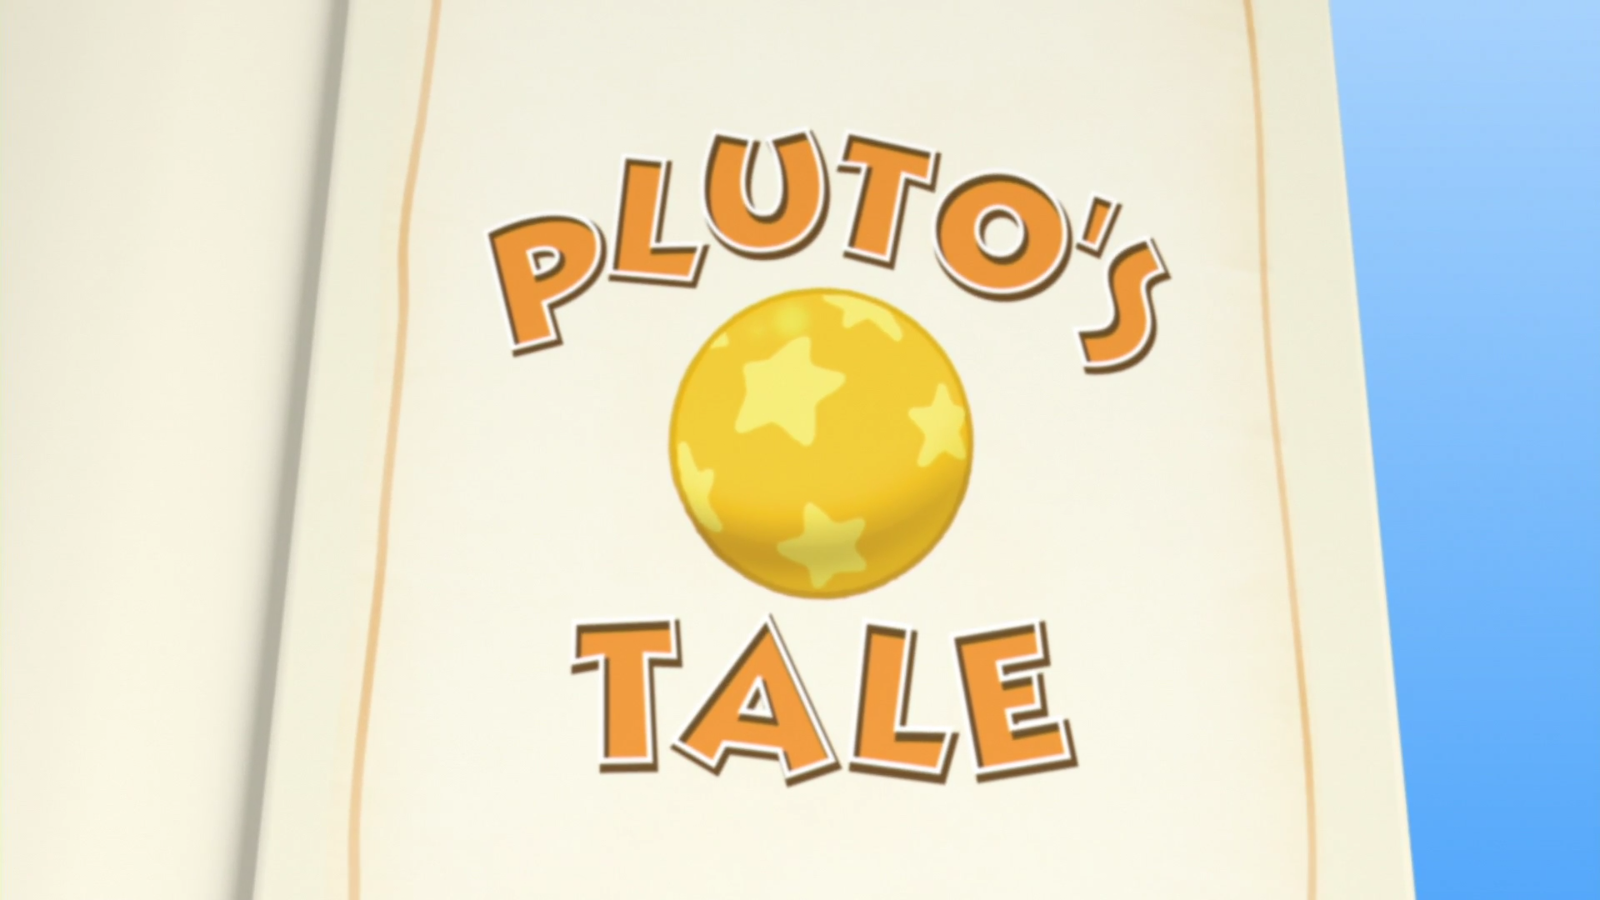 Pluto's Tale